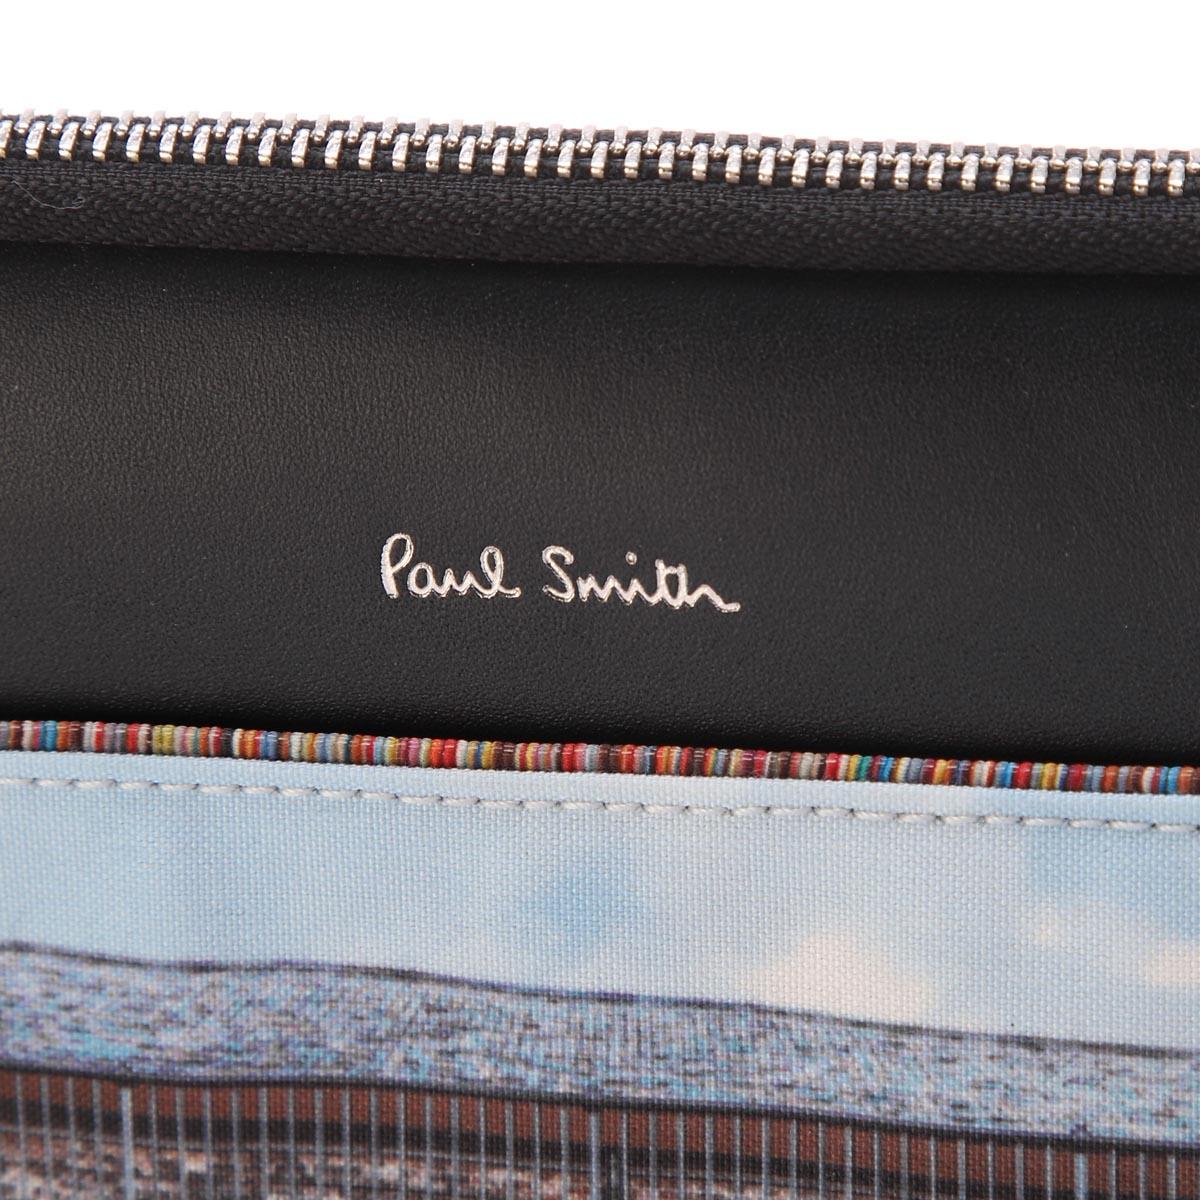 Paul Smith ポールスミス ノートPCケース/タブレットケース/MINI KINGS CROSS メンズ